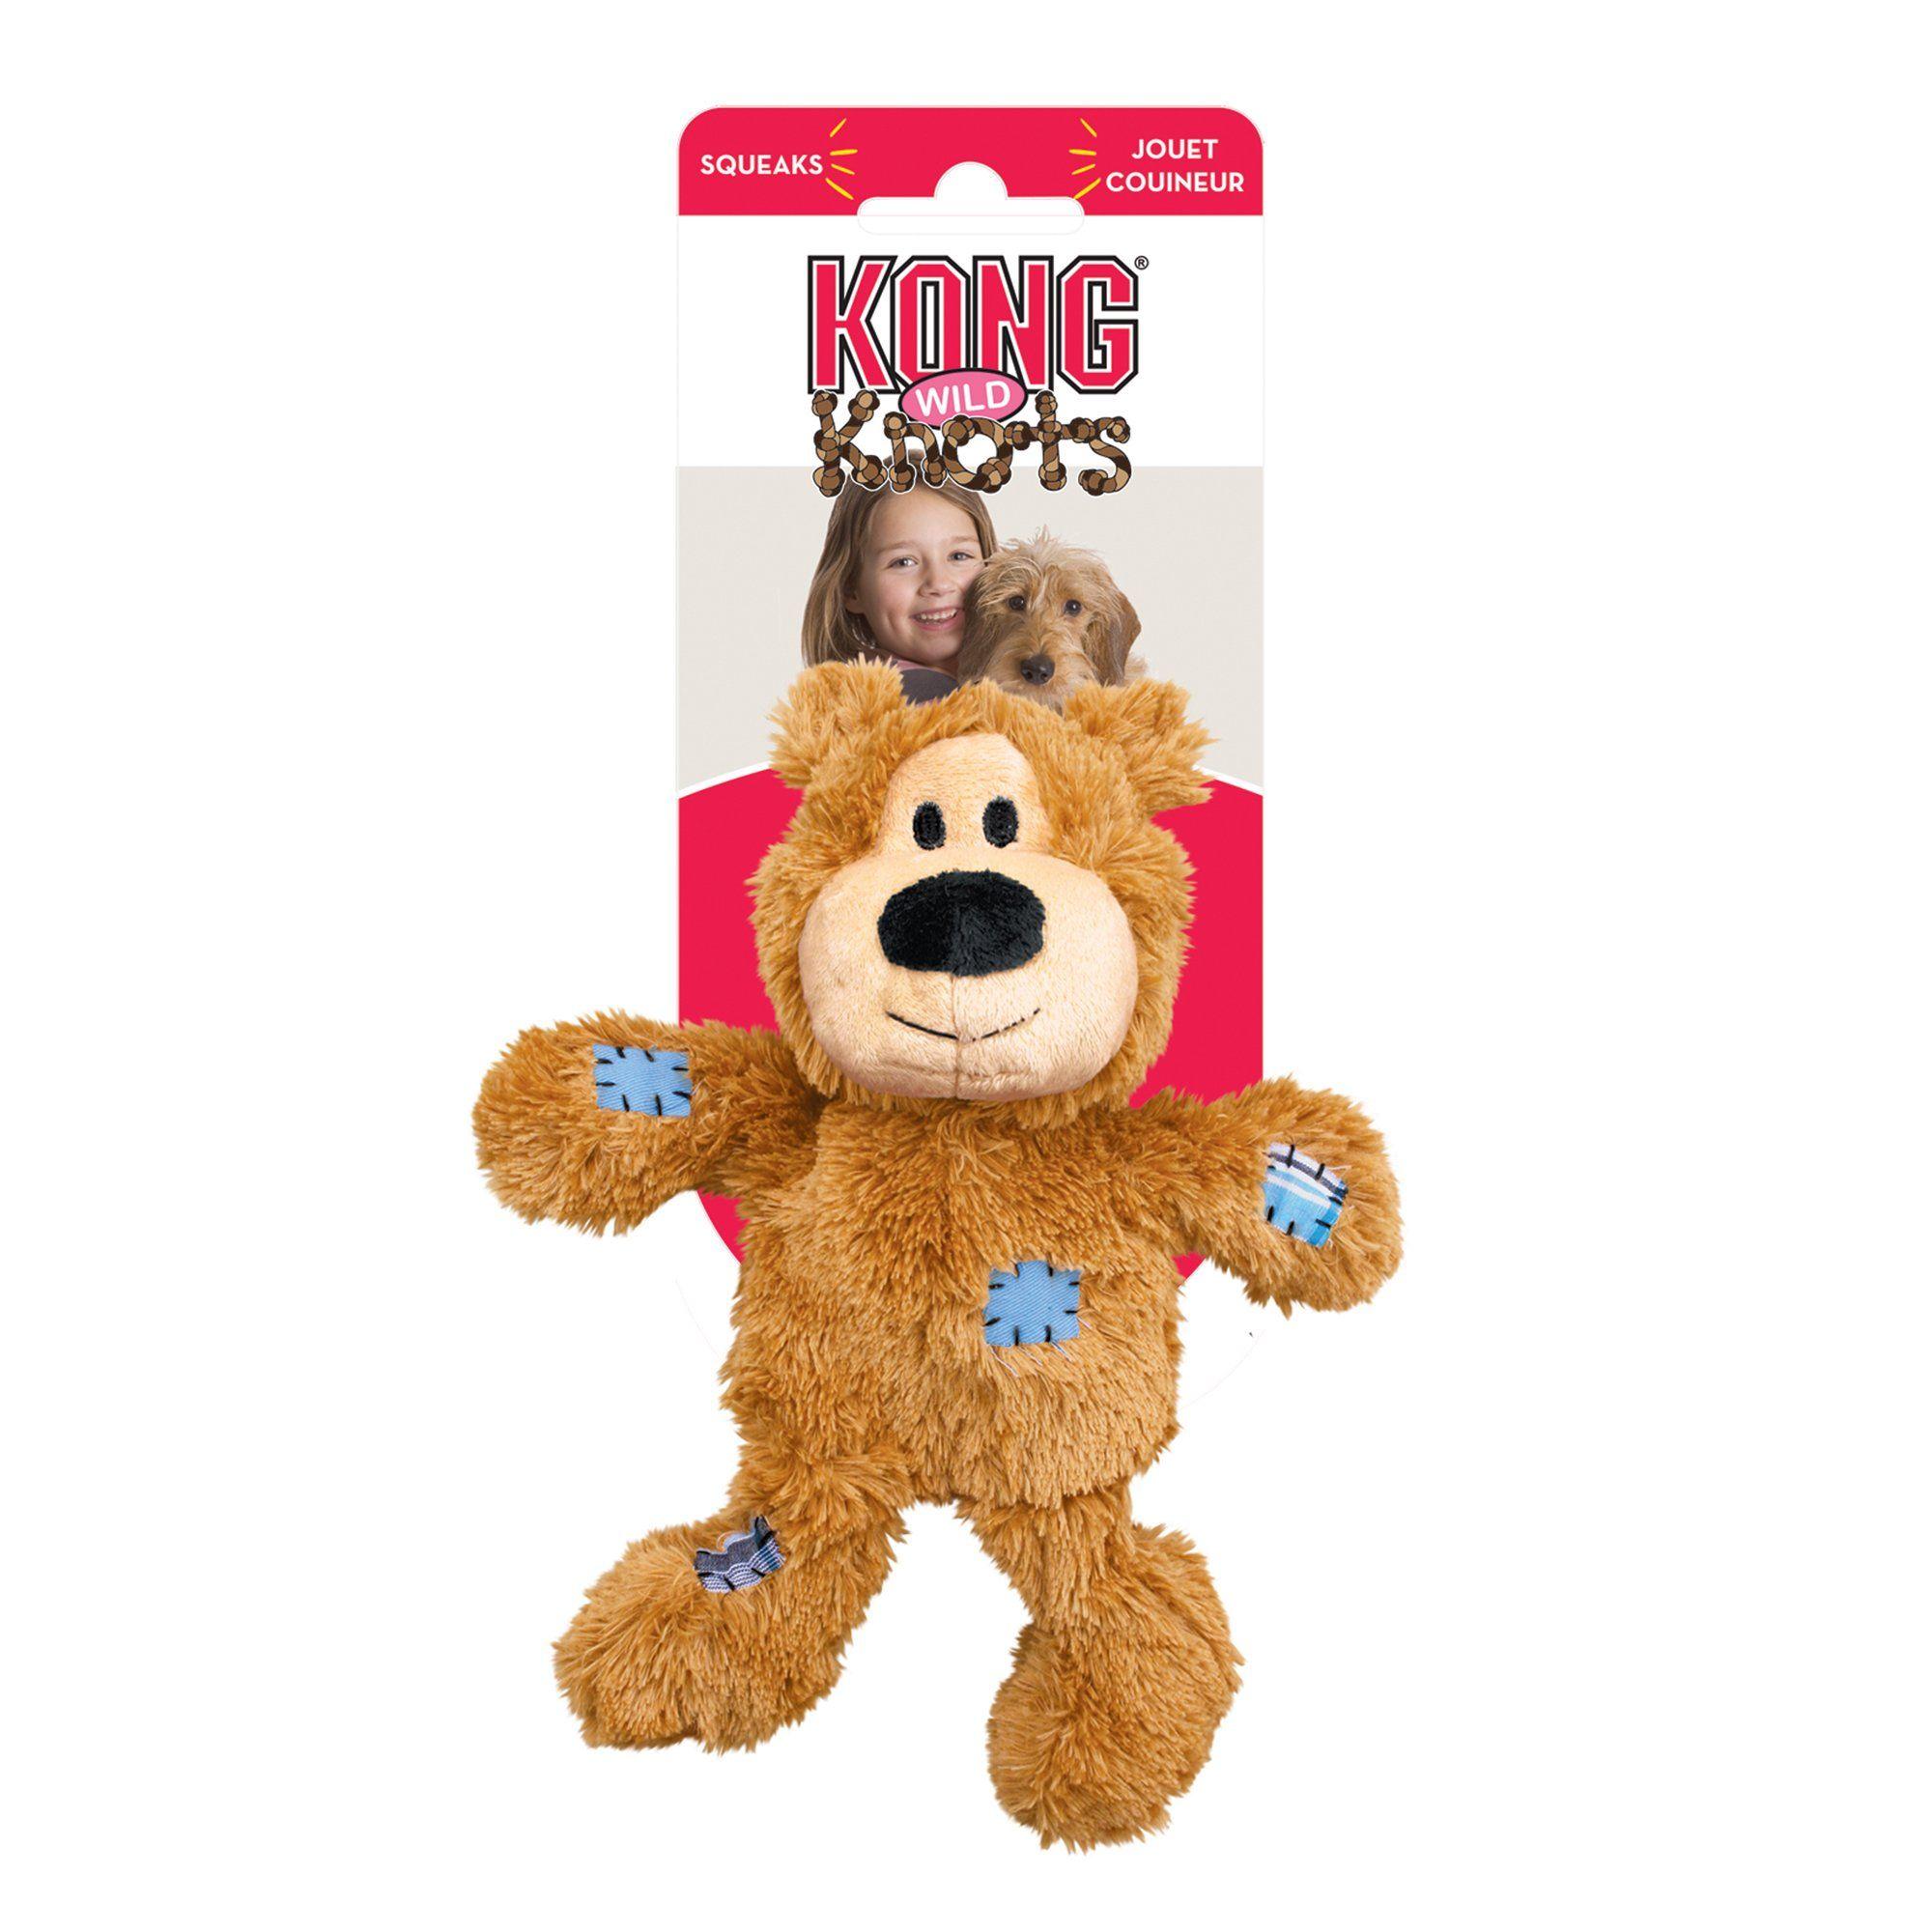 Kong Wild Knots Bear Dog Tug Toy Medium Assorted In 2019 Small